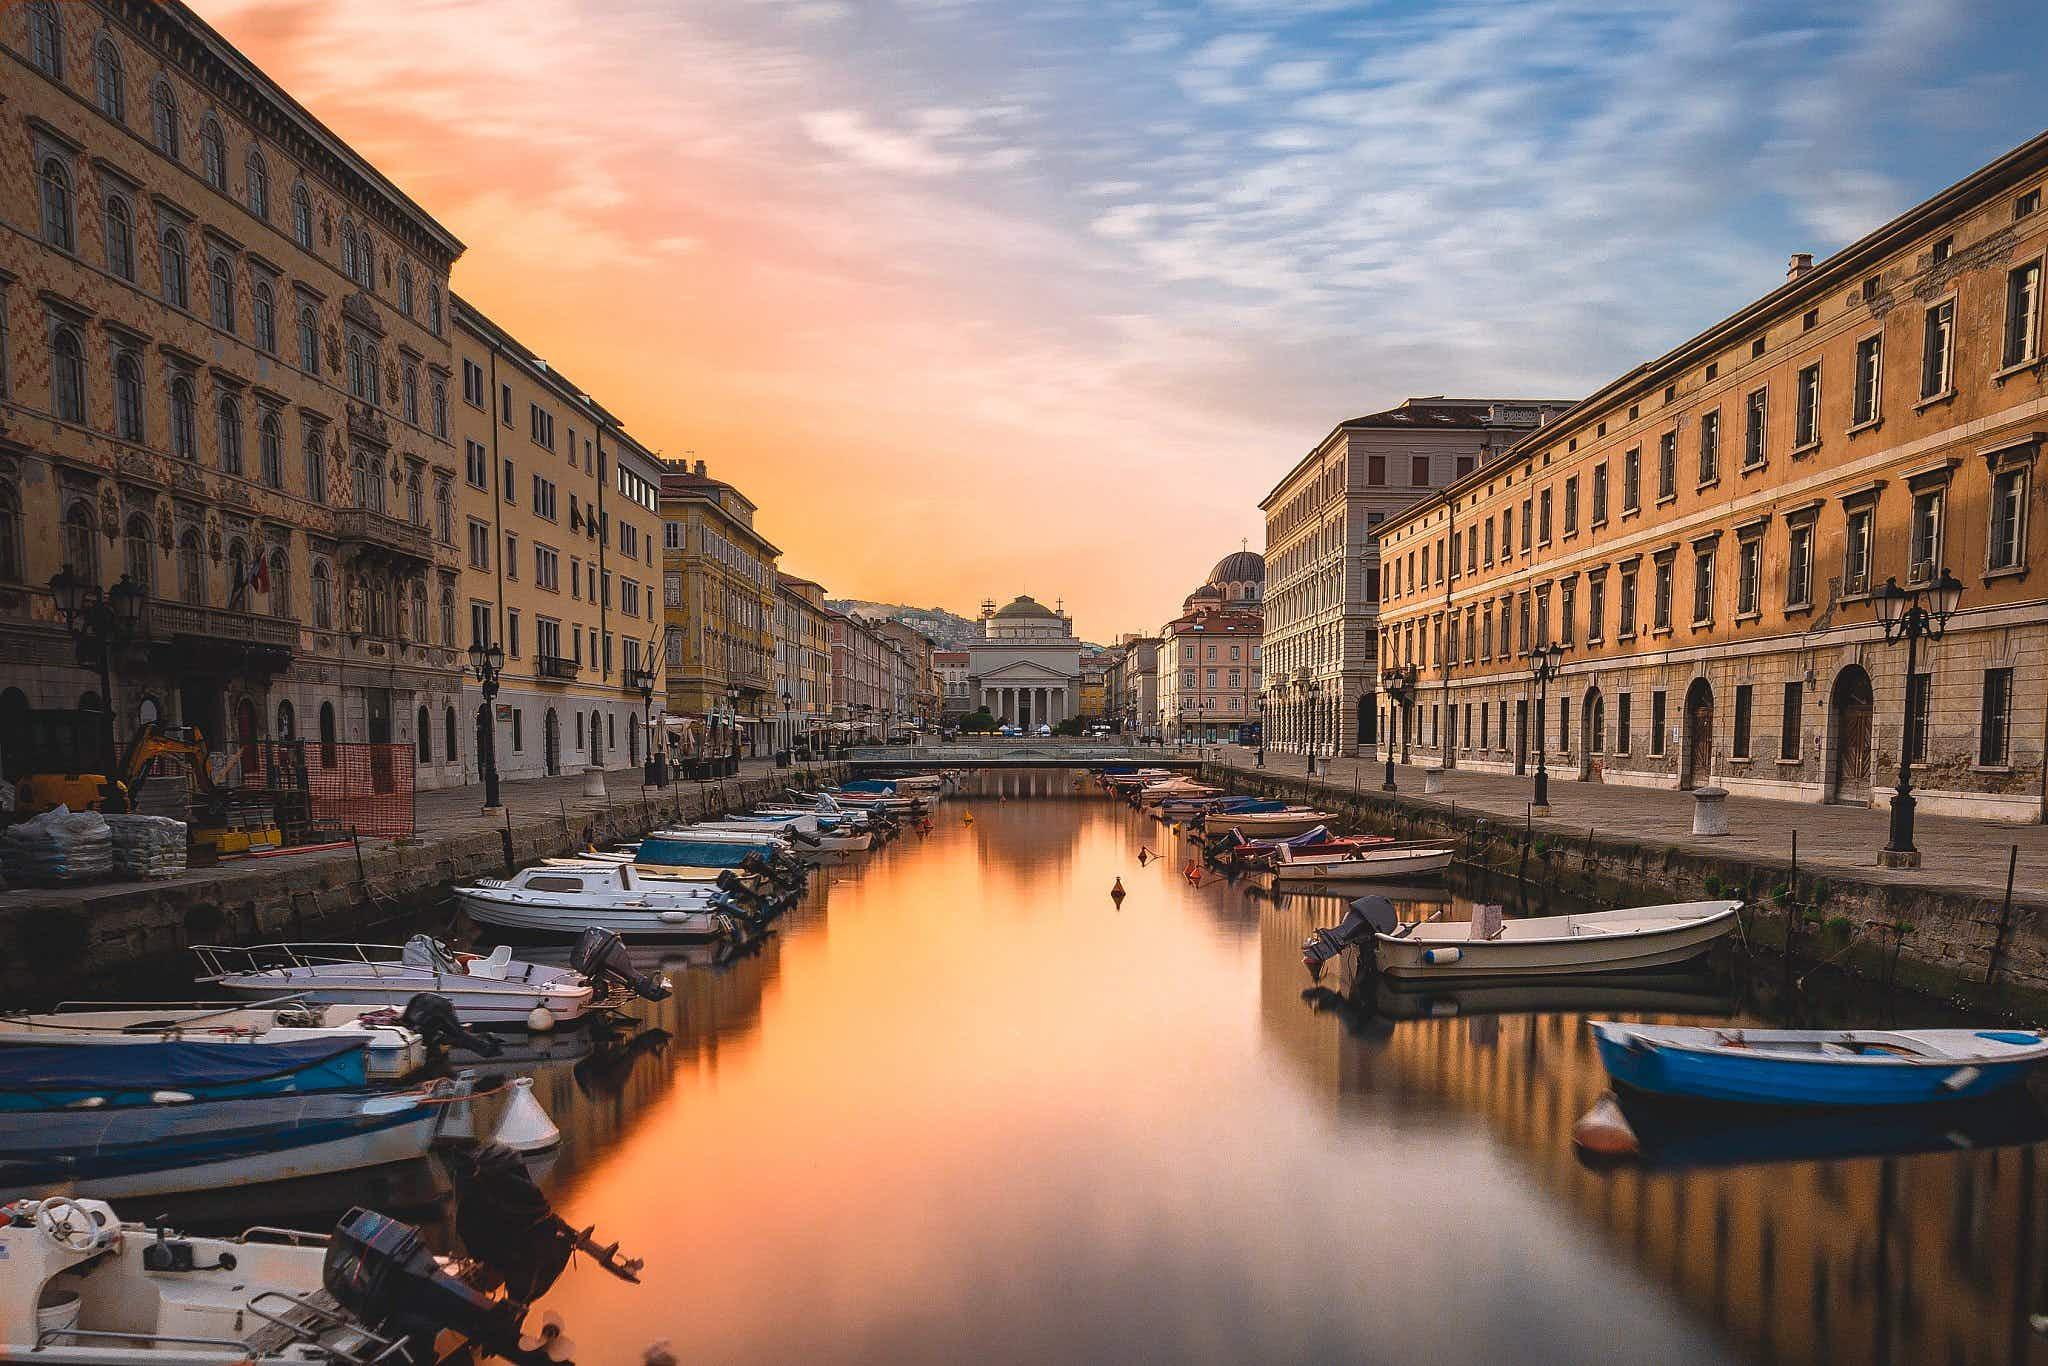 Trieste's Canal Grande at sunrise © Filippo Ferraro / Shutterstock